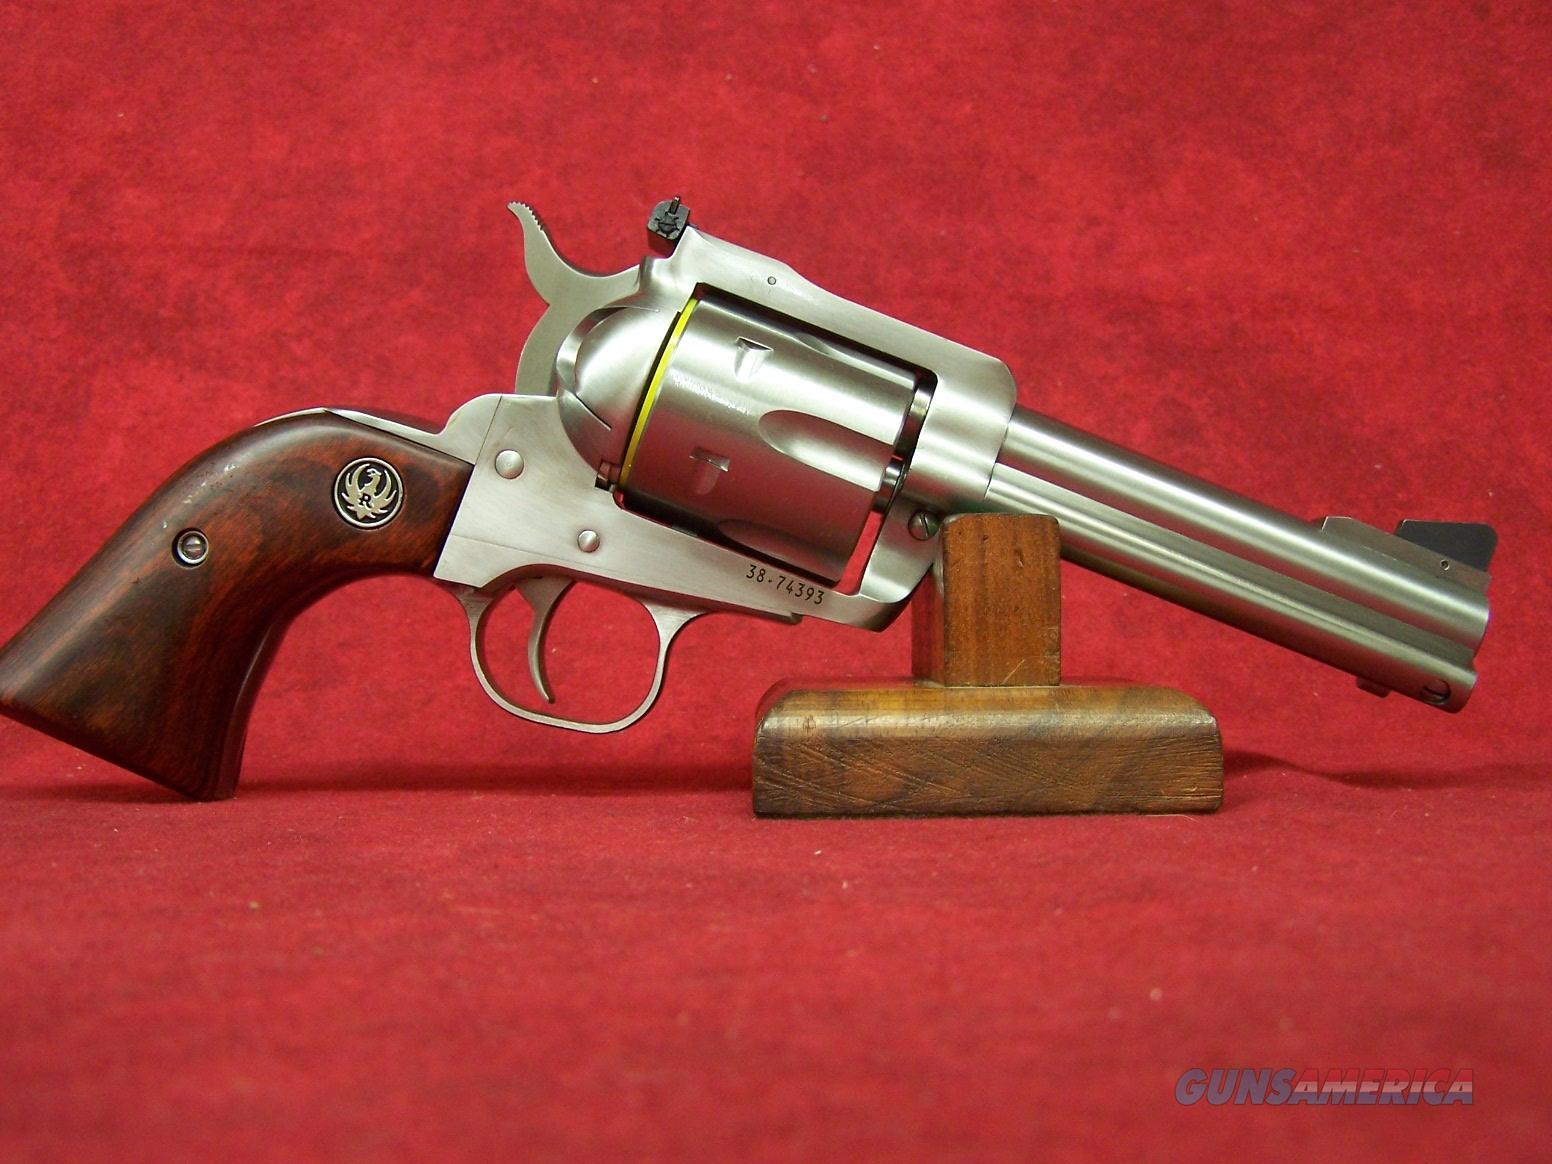 "Ruger New Model Blackhawk 10mm / 40 S&W 4.62"" Barrel (00476)  Guns > Pistols > Ruger Single Action Revolvers > Blackhawk Type"